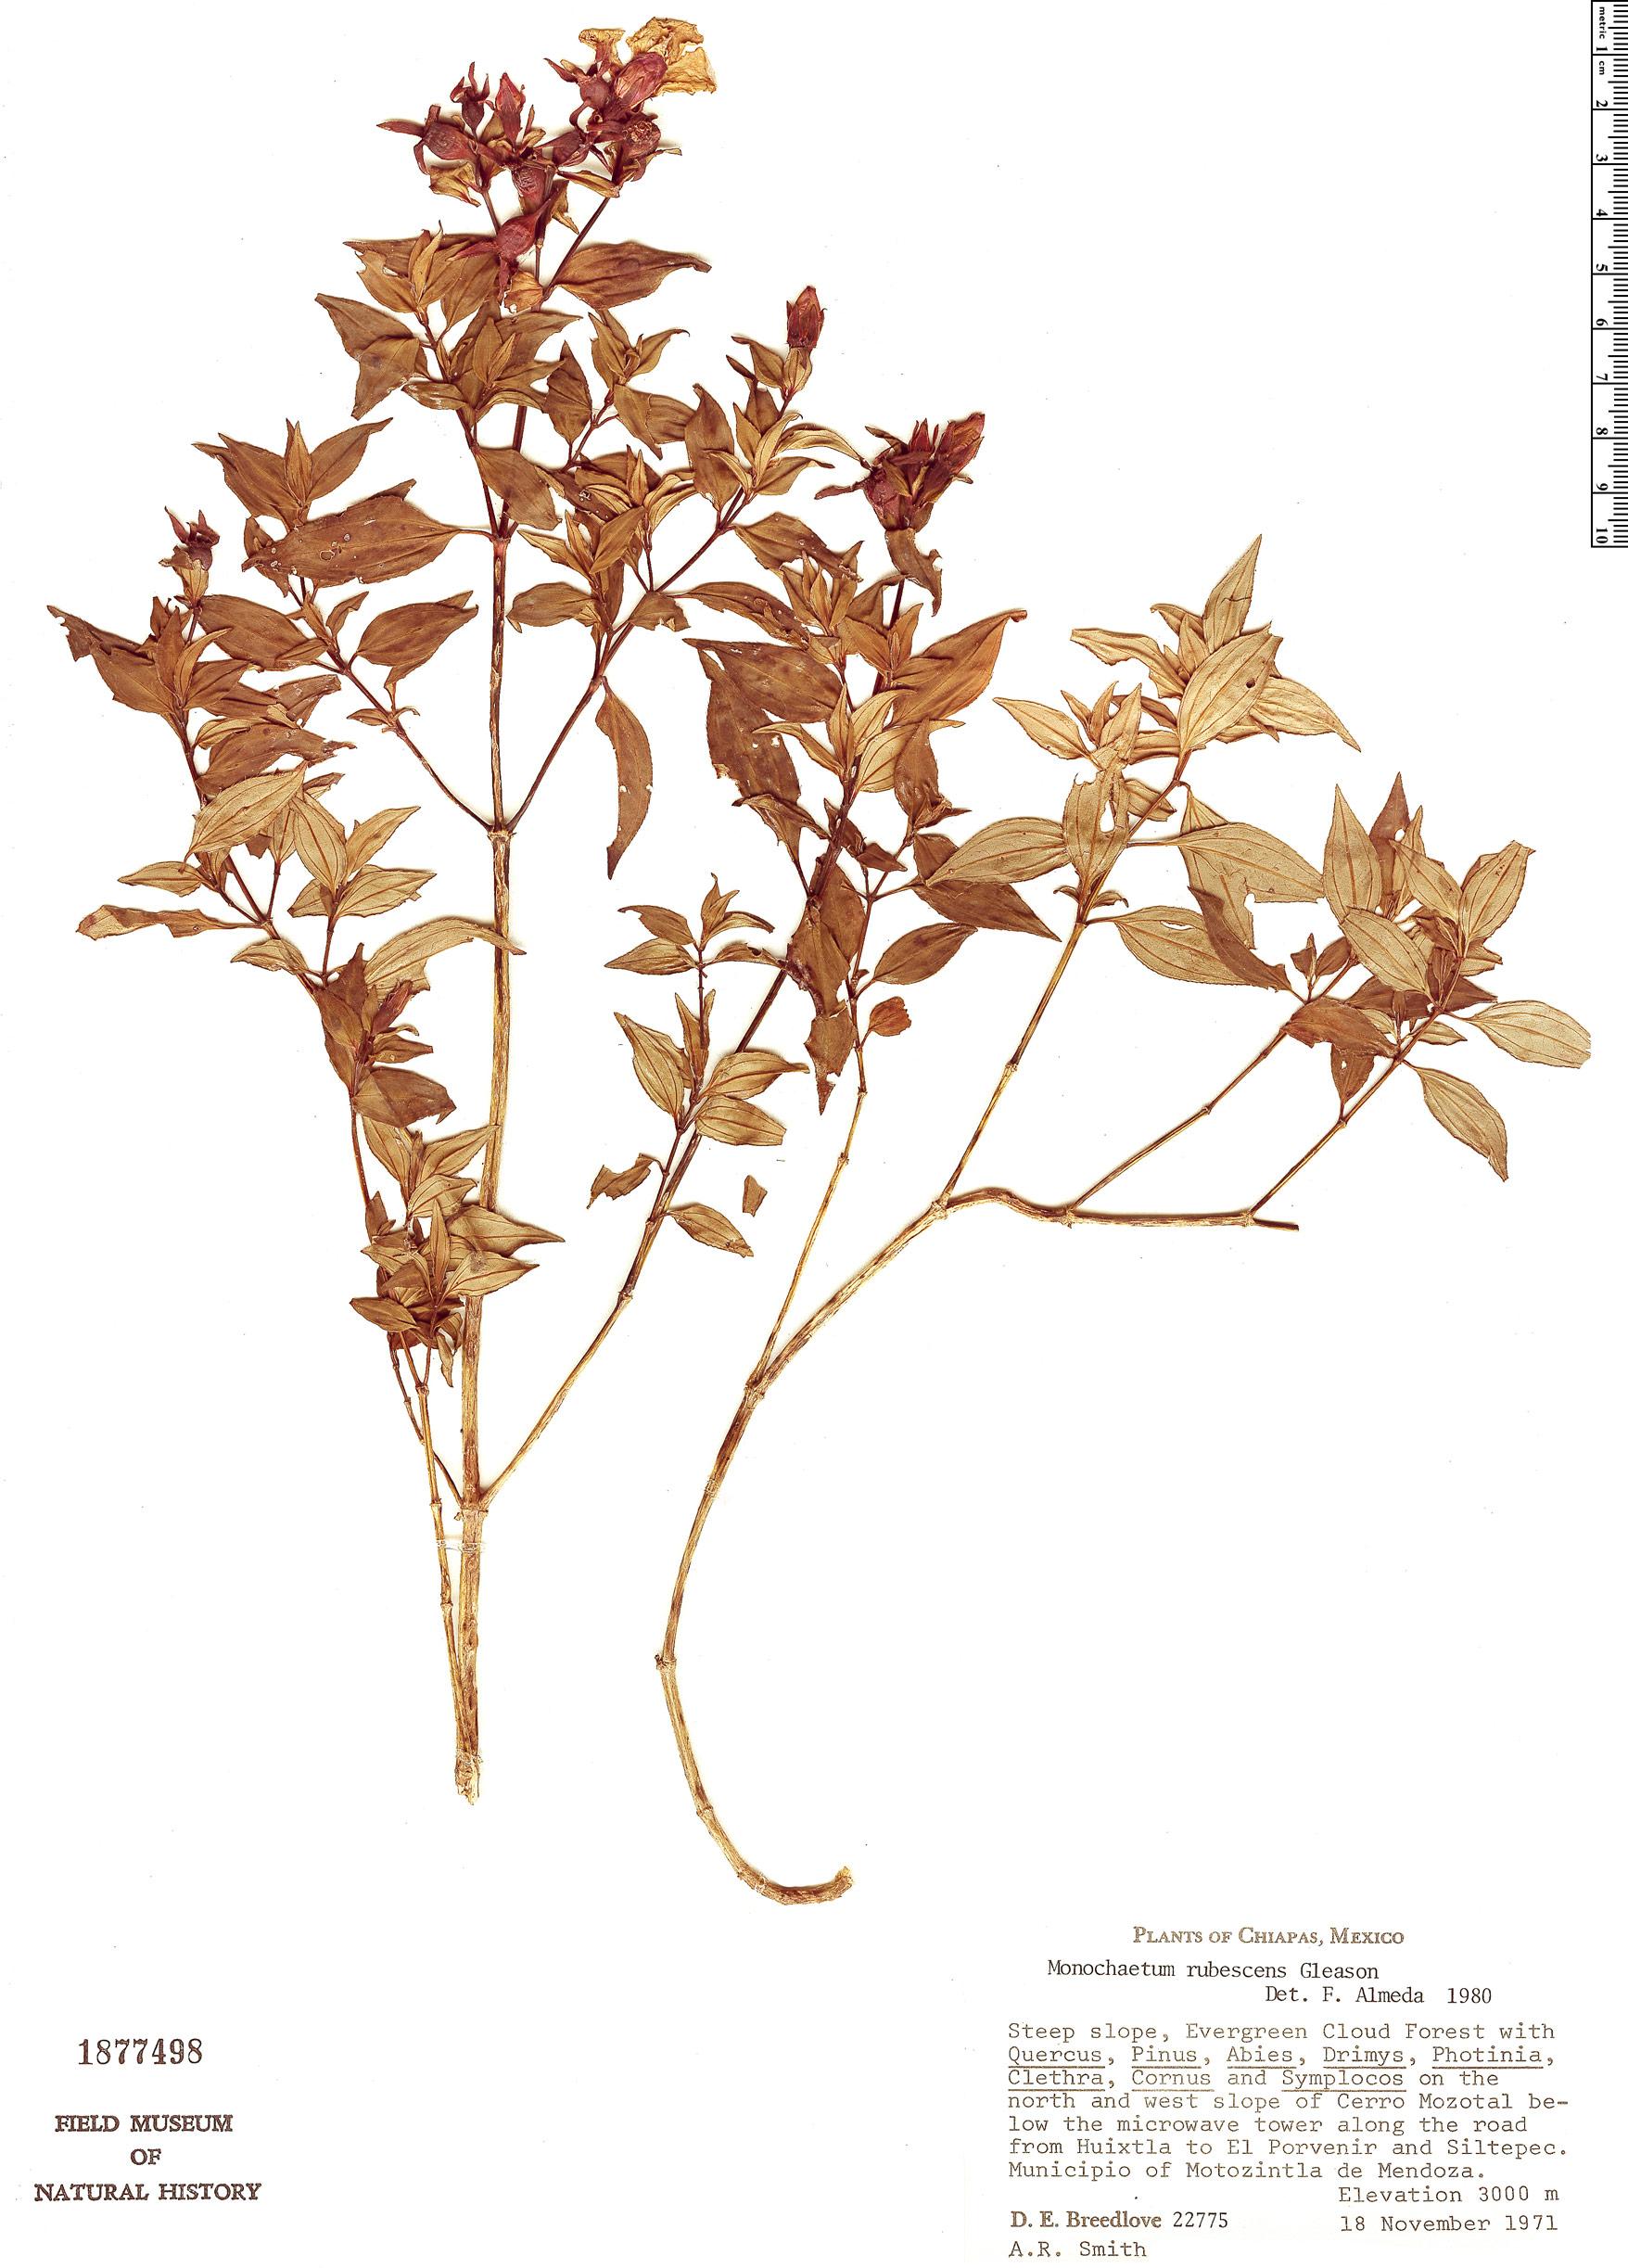 Specimen: Monochaetum rubescens